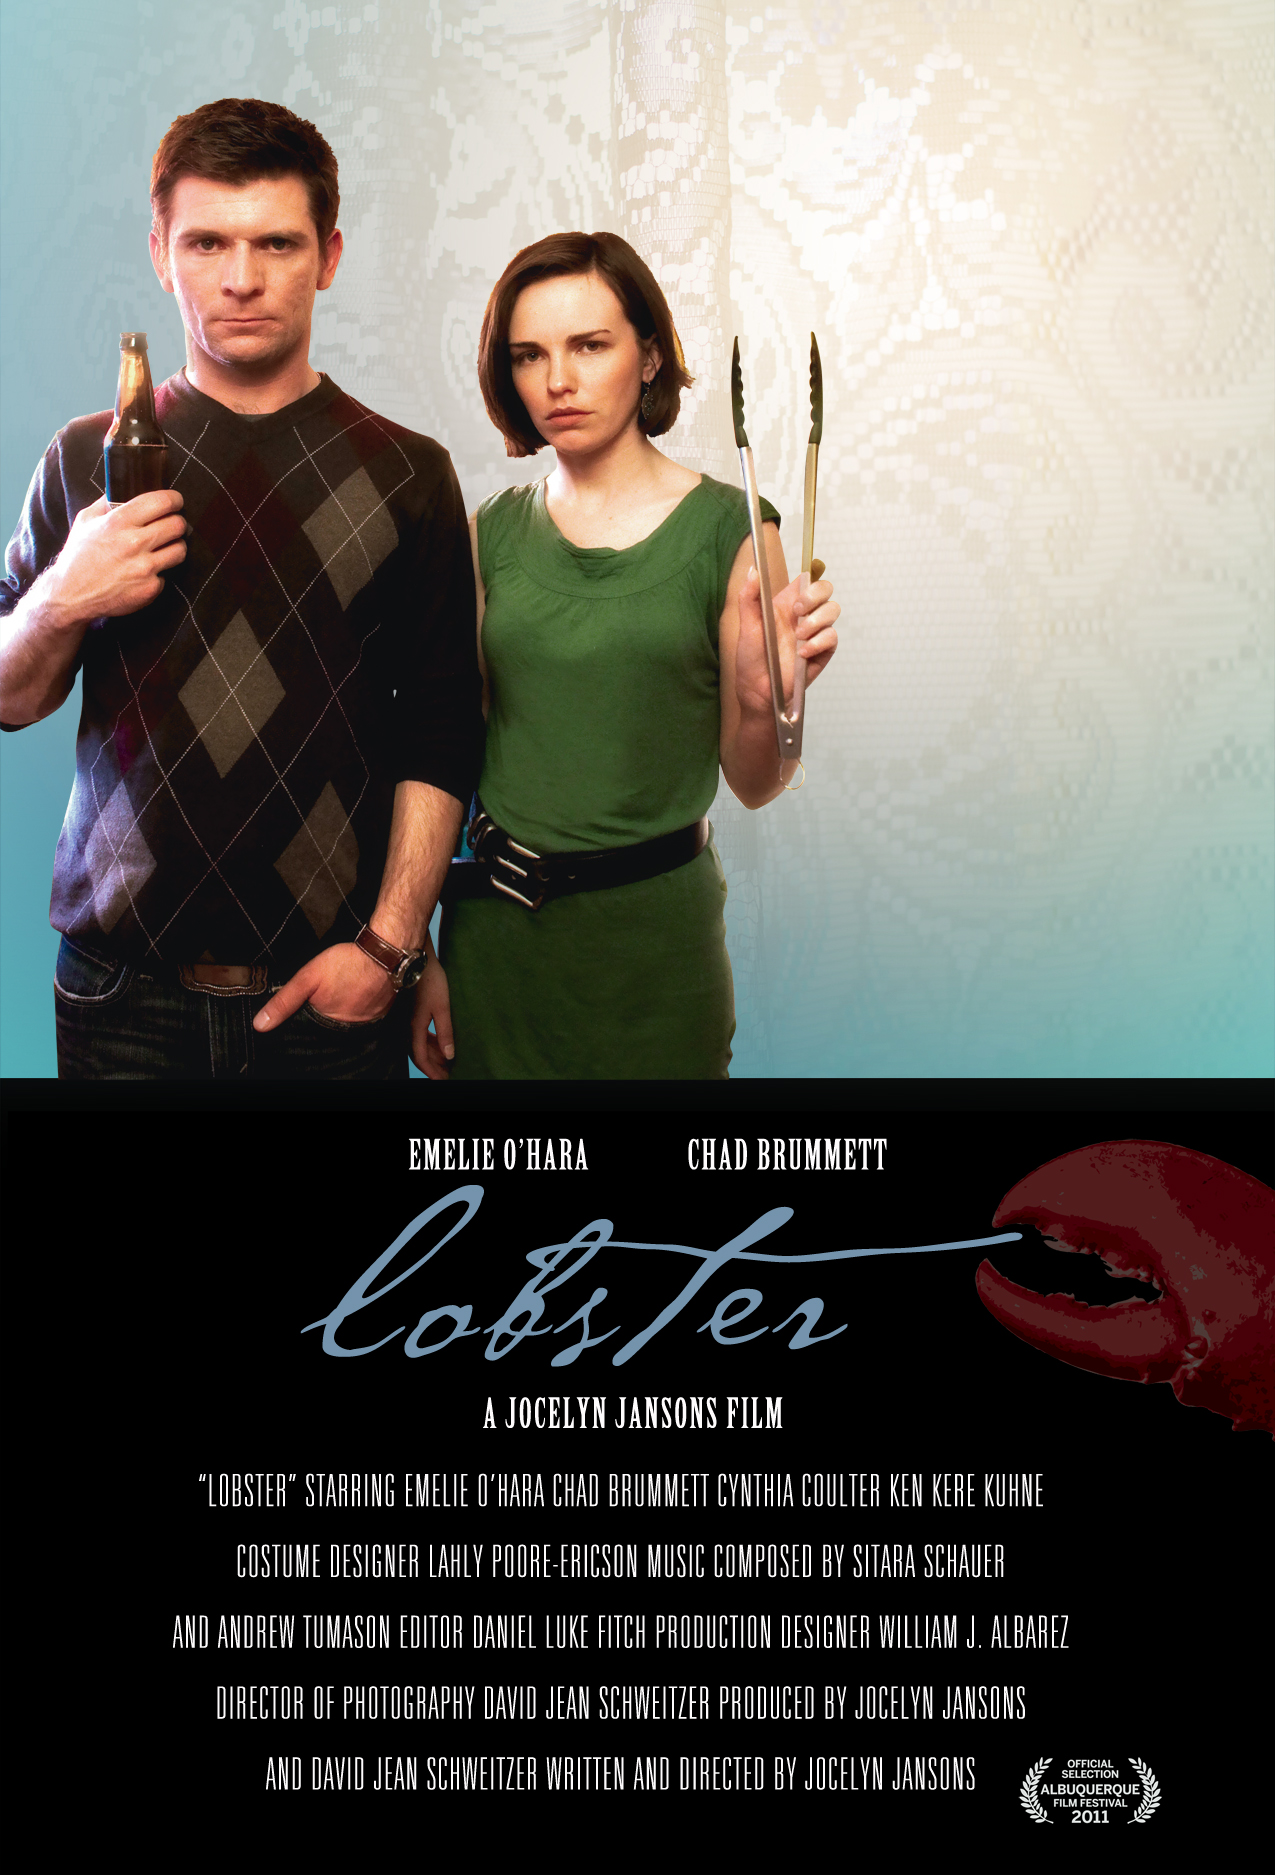 Poster design by Gabriella Marks.